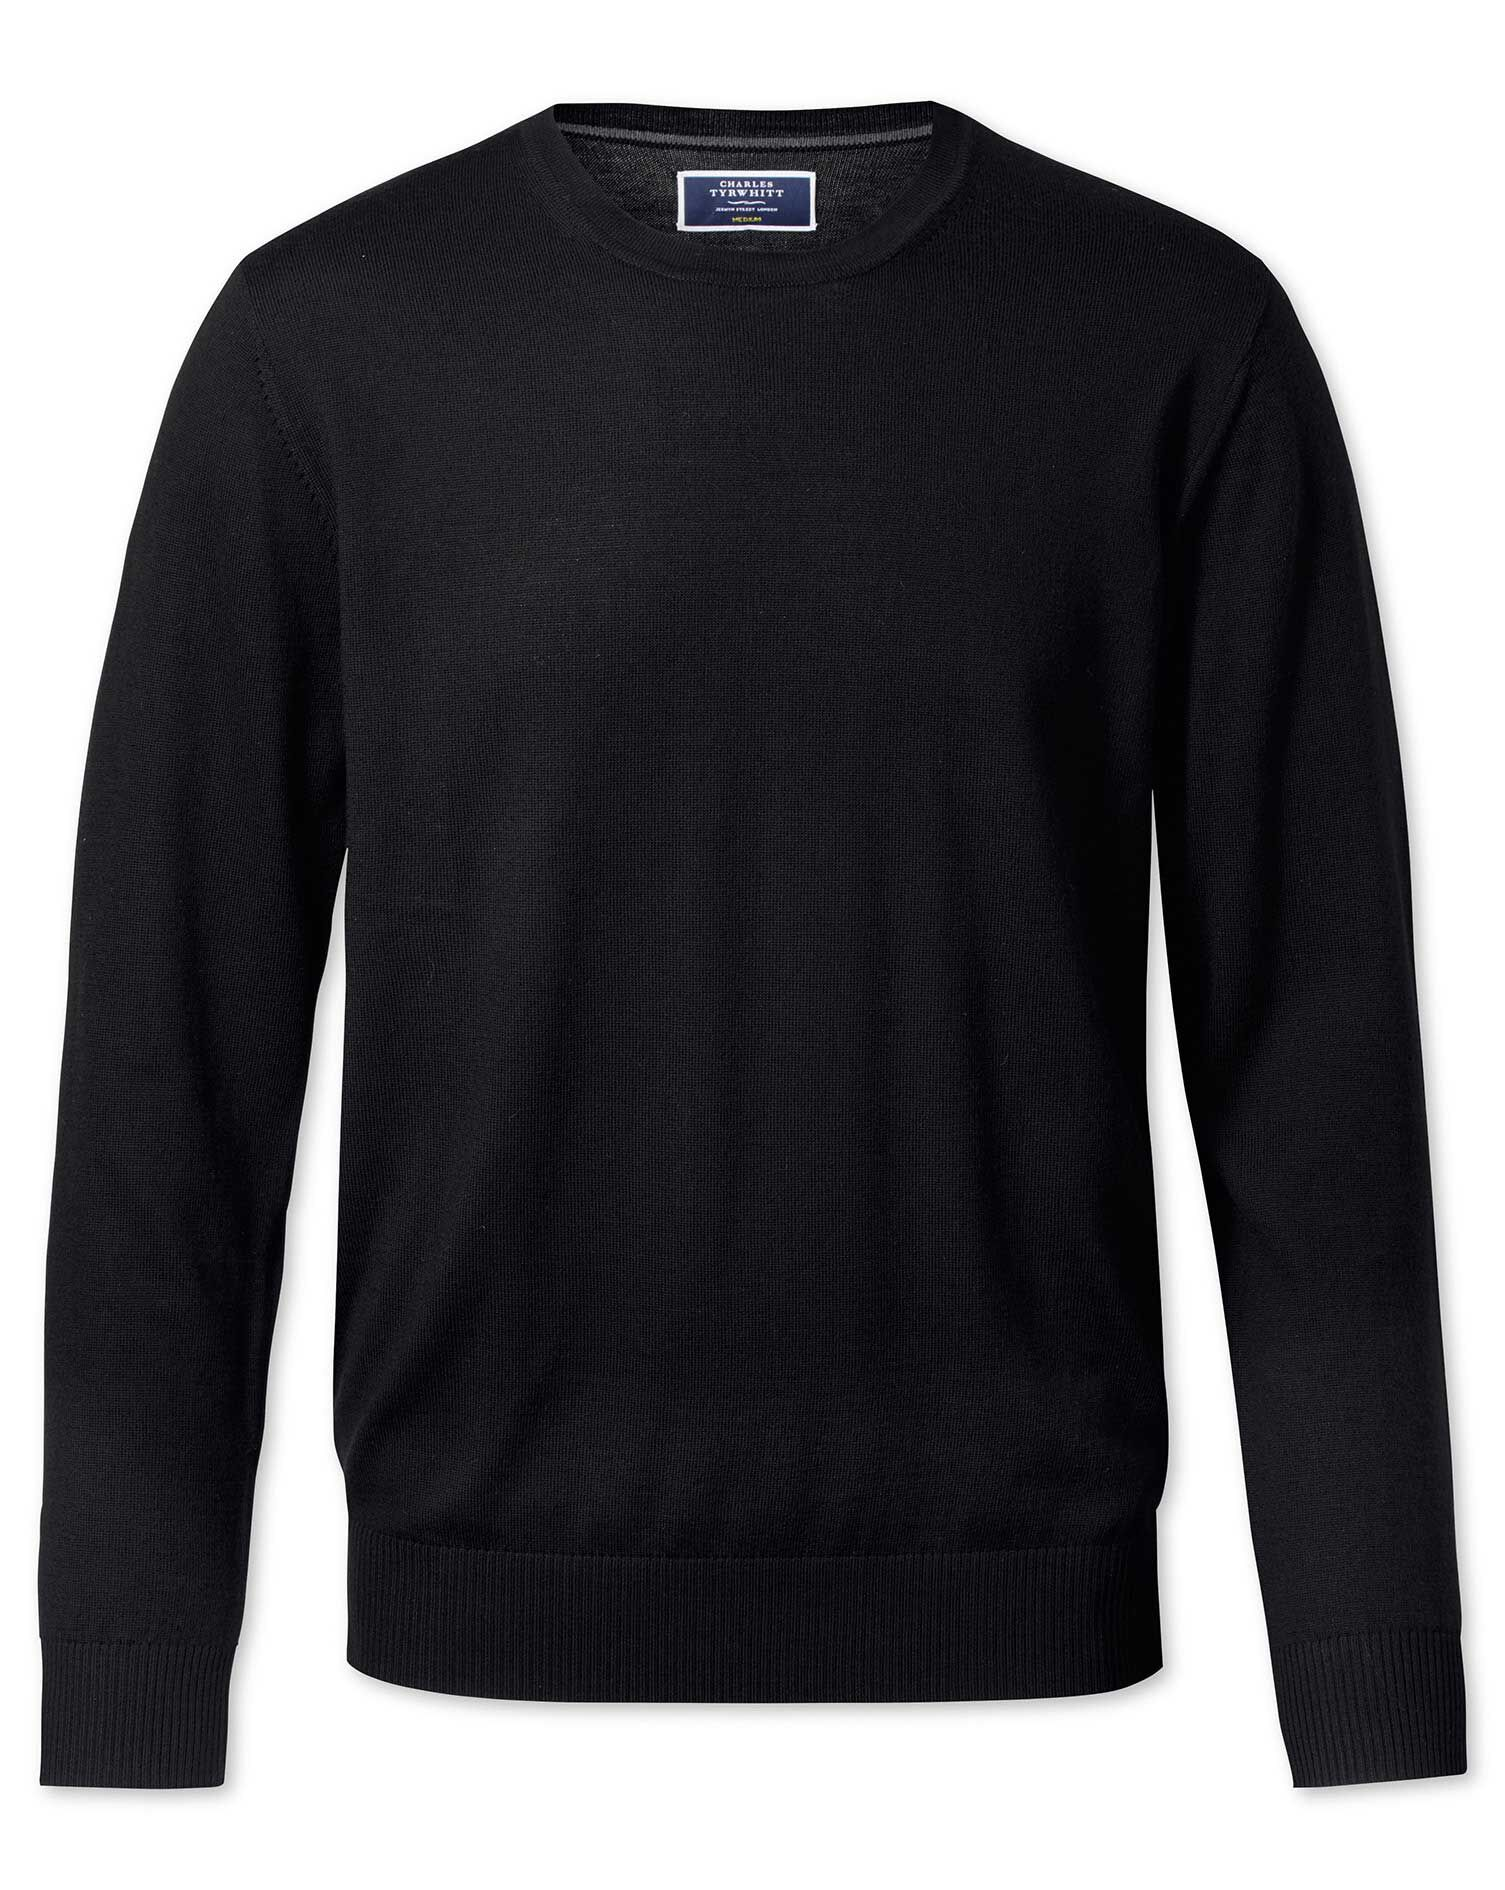 Black Merino Wool Crew Neck Jumper Size XS by Charles Tyrwhitt